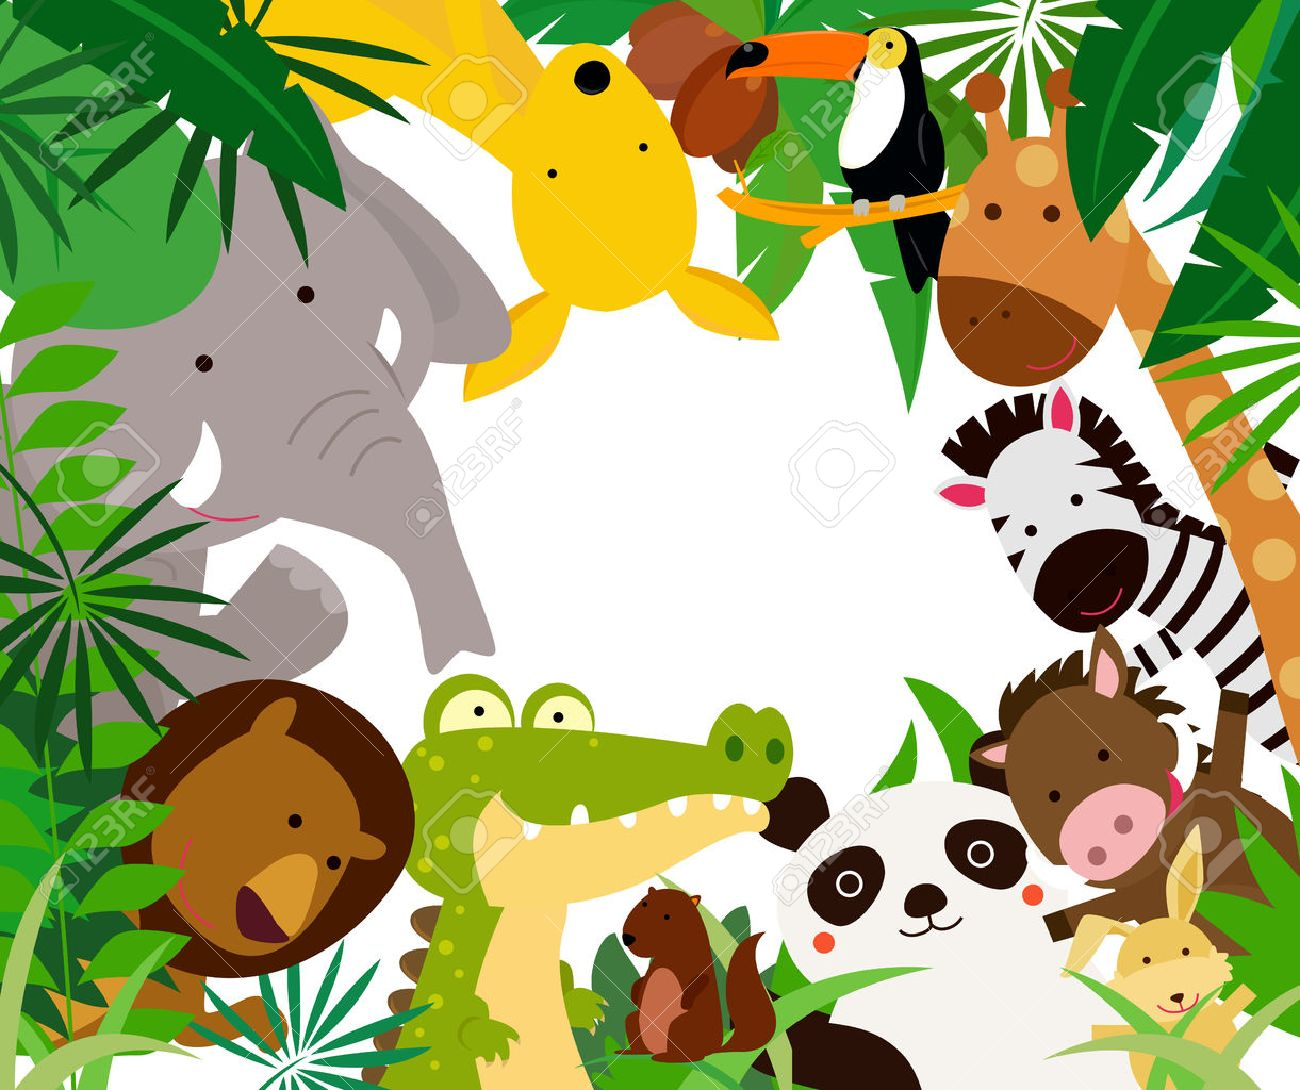 Fun Jungle Animals Border Royalty Free Cliparts, Vectors, And ...